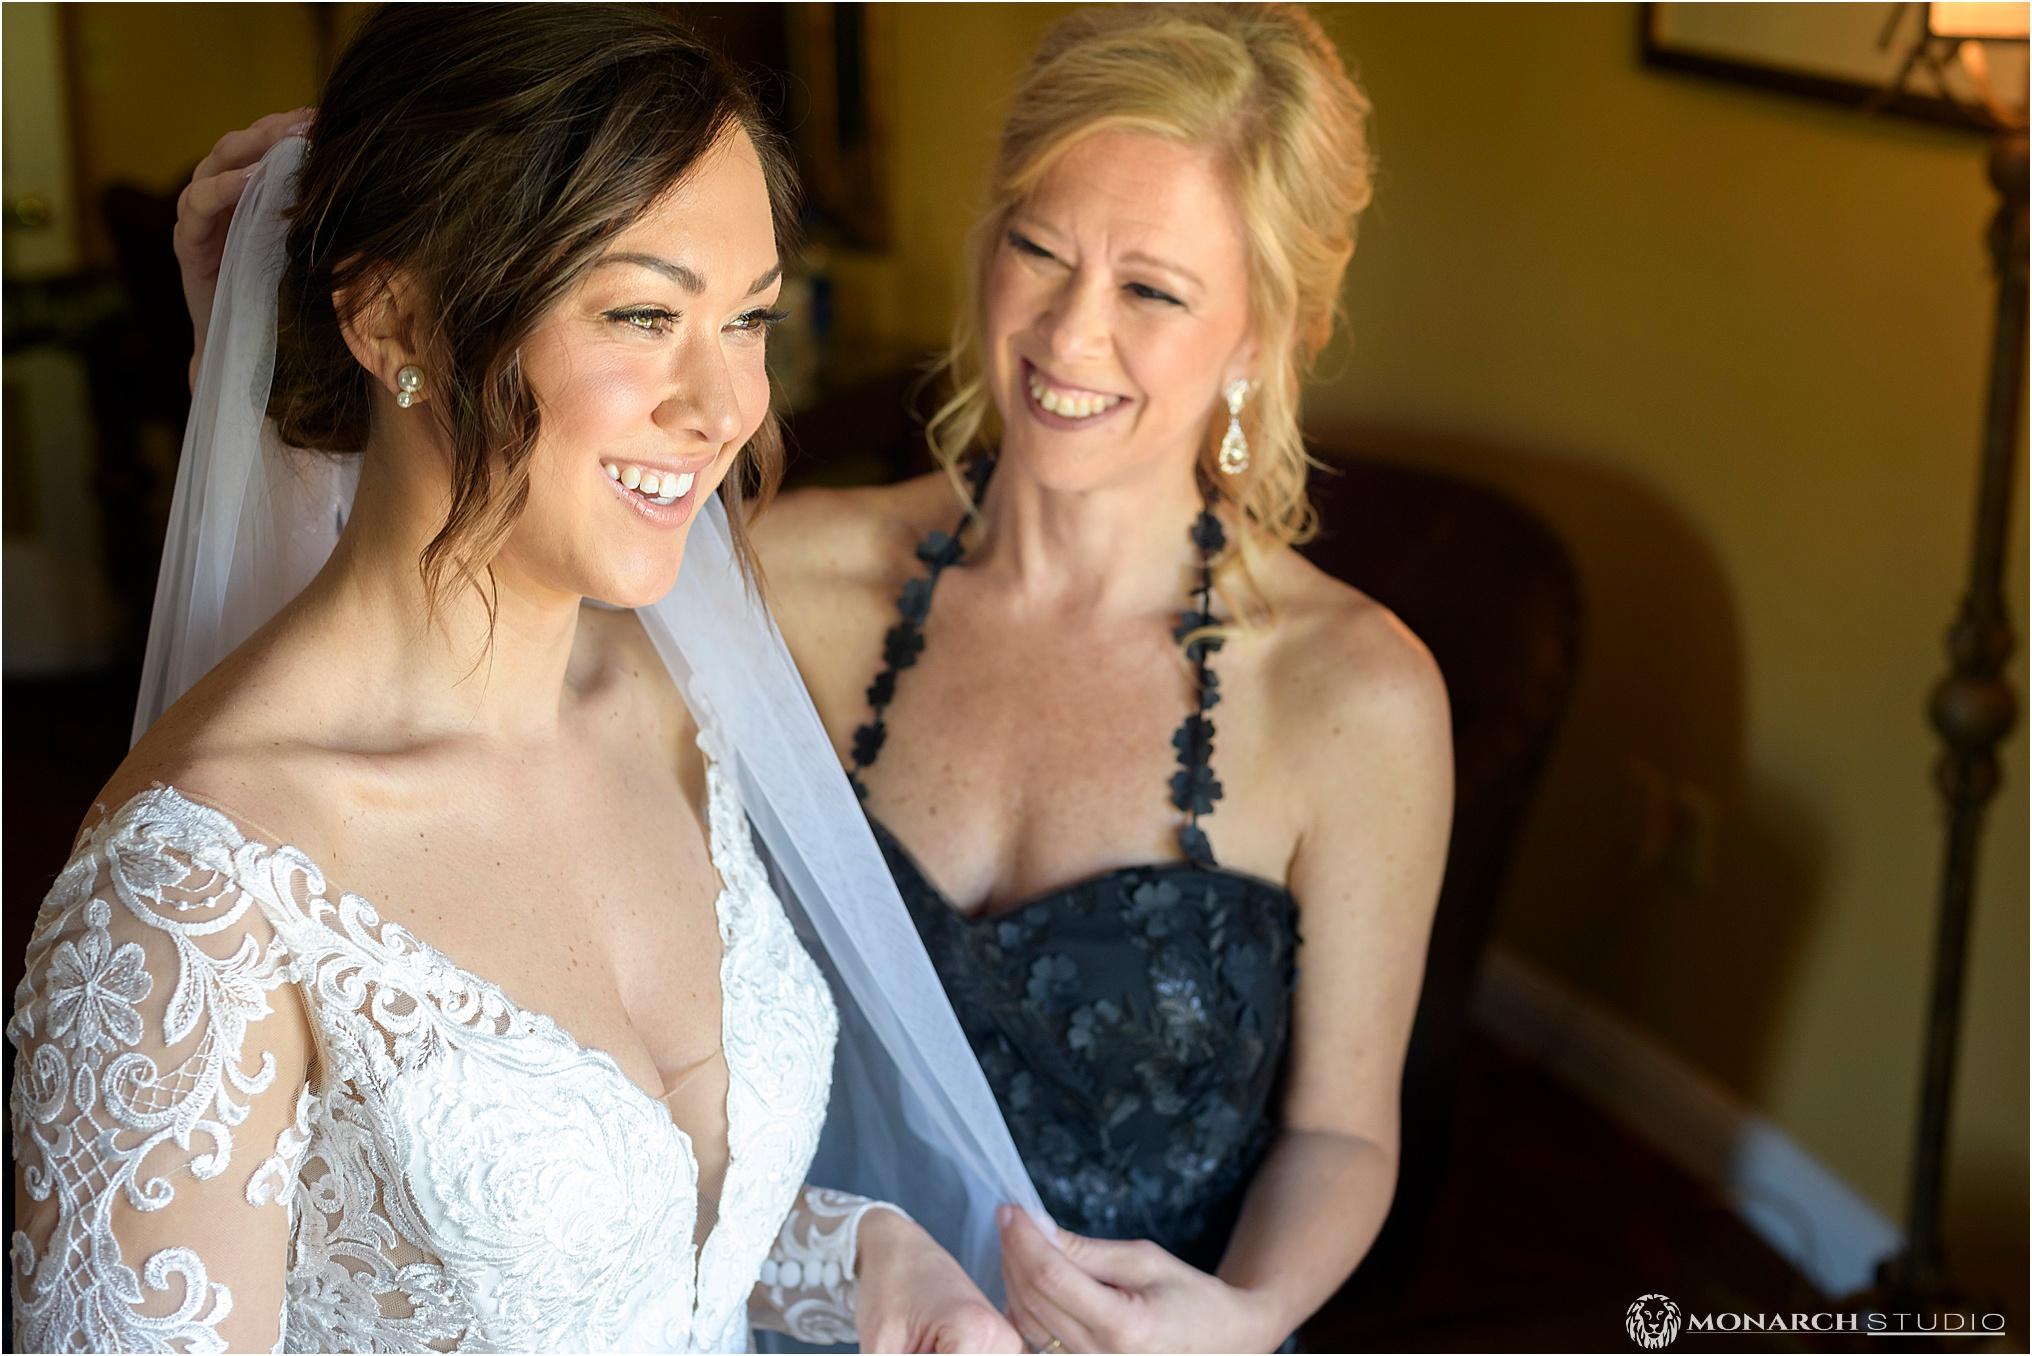 st-augustine-high-end-wedding-photographers-020.jpg